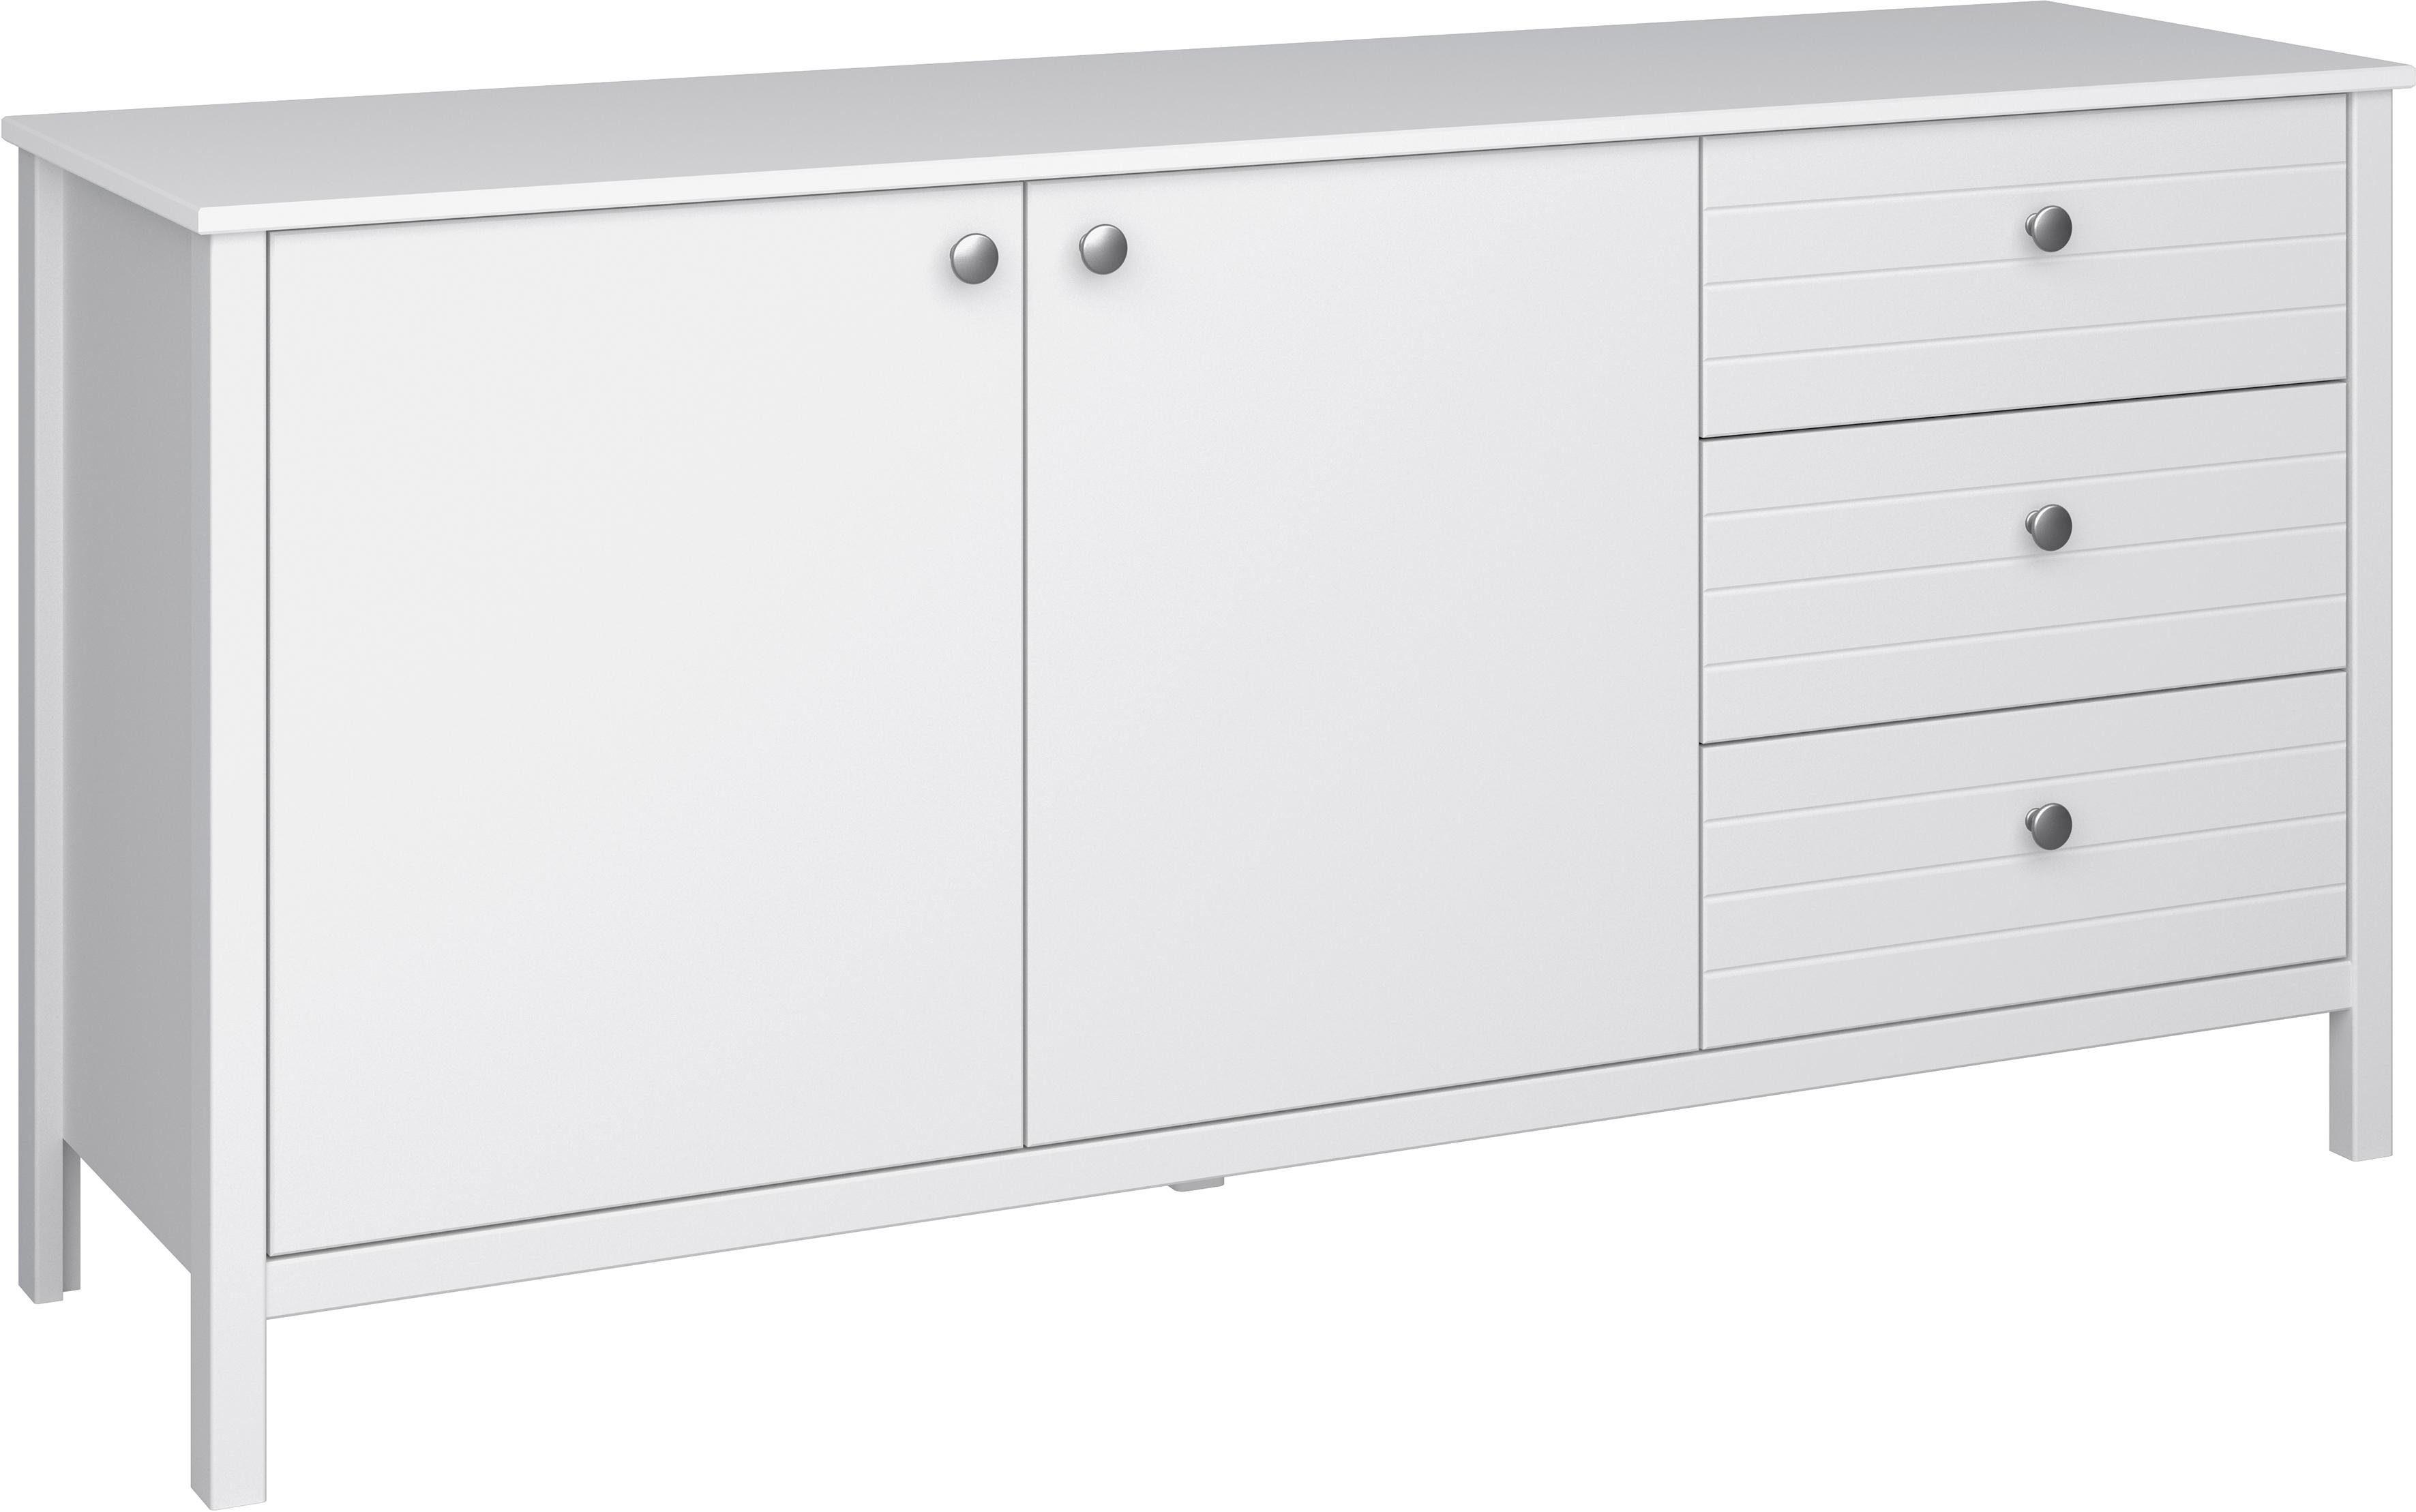 andas Sideboard »New York«, Breite 150 cm